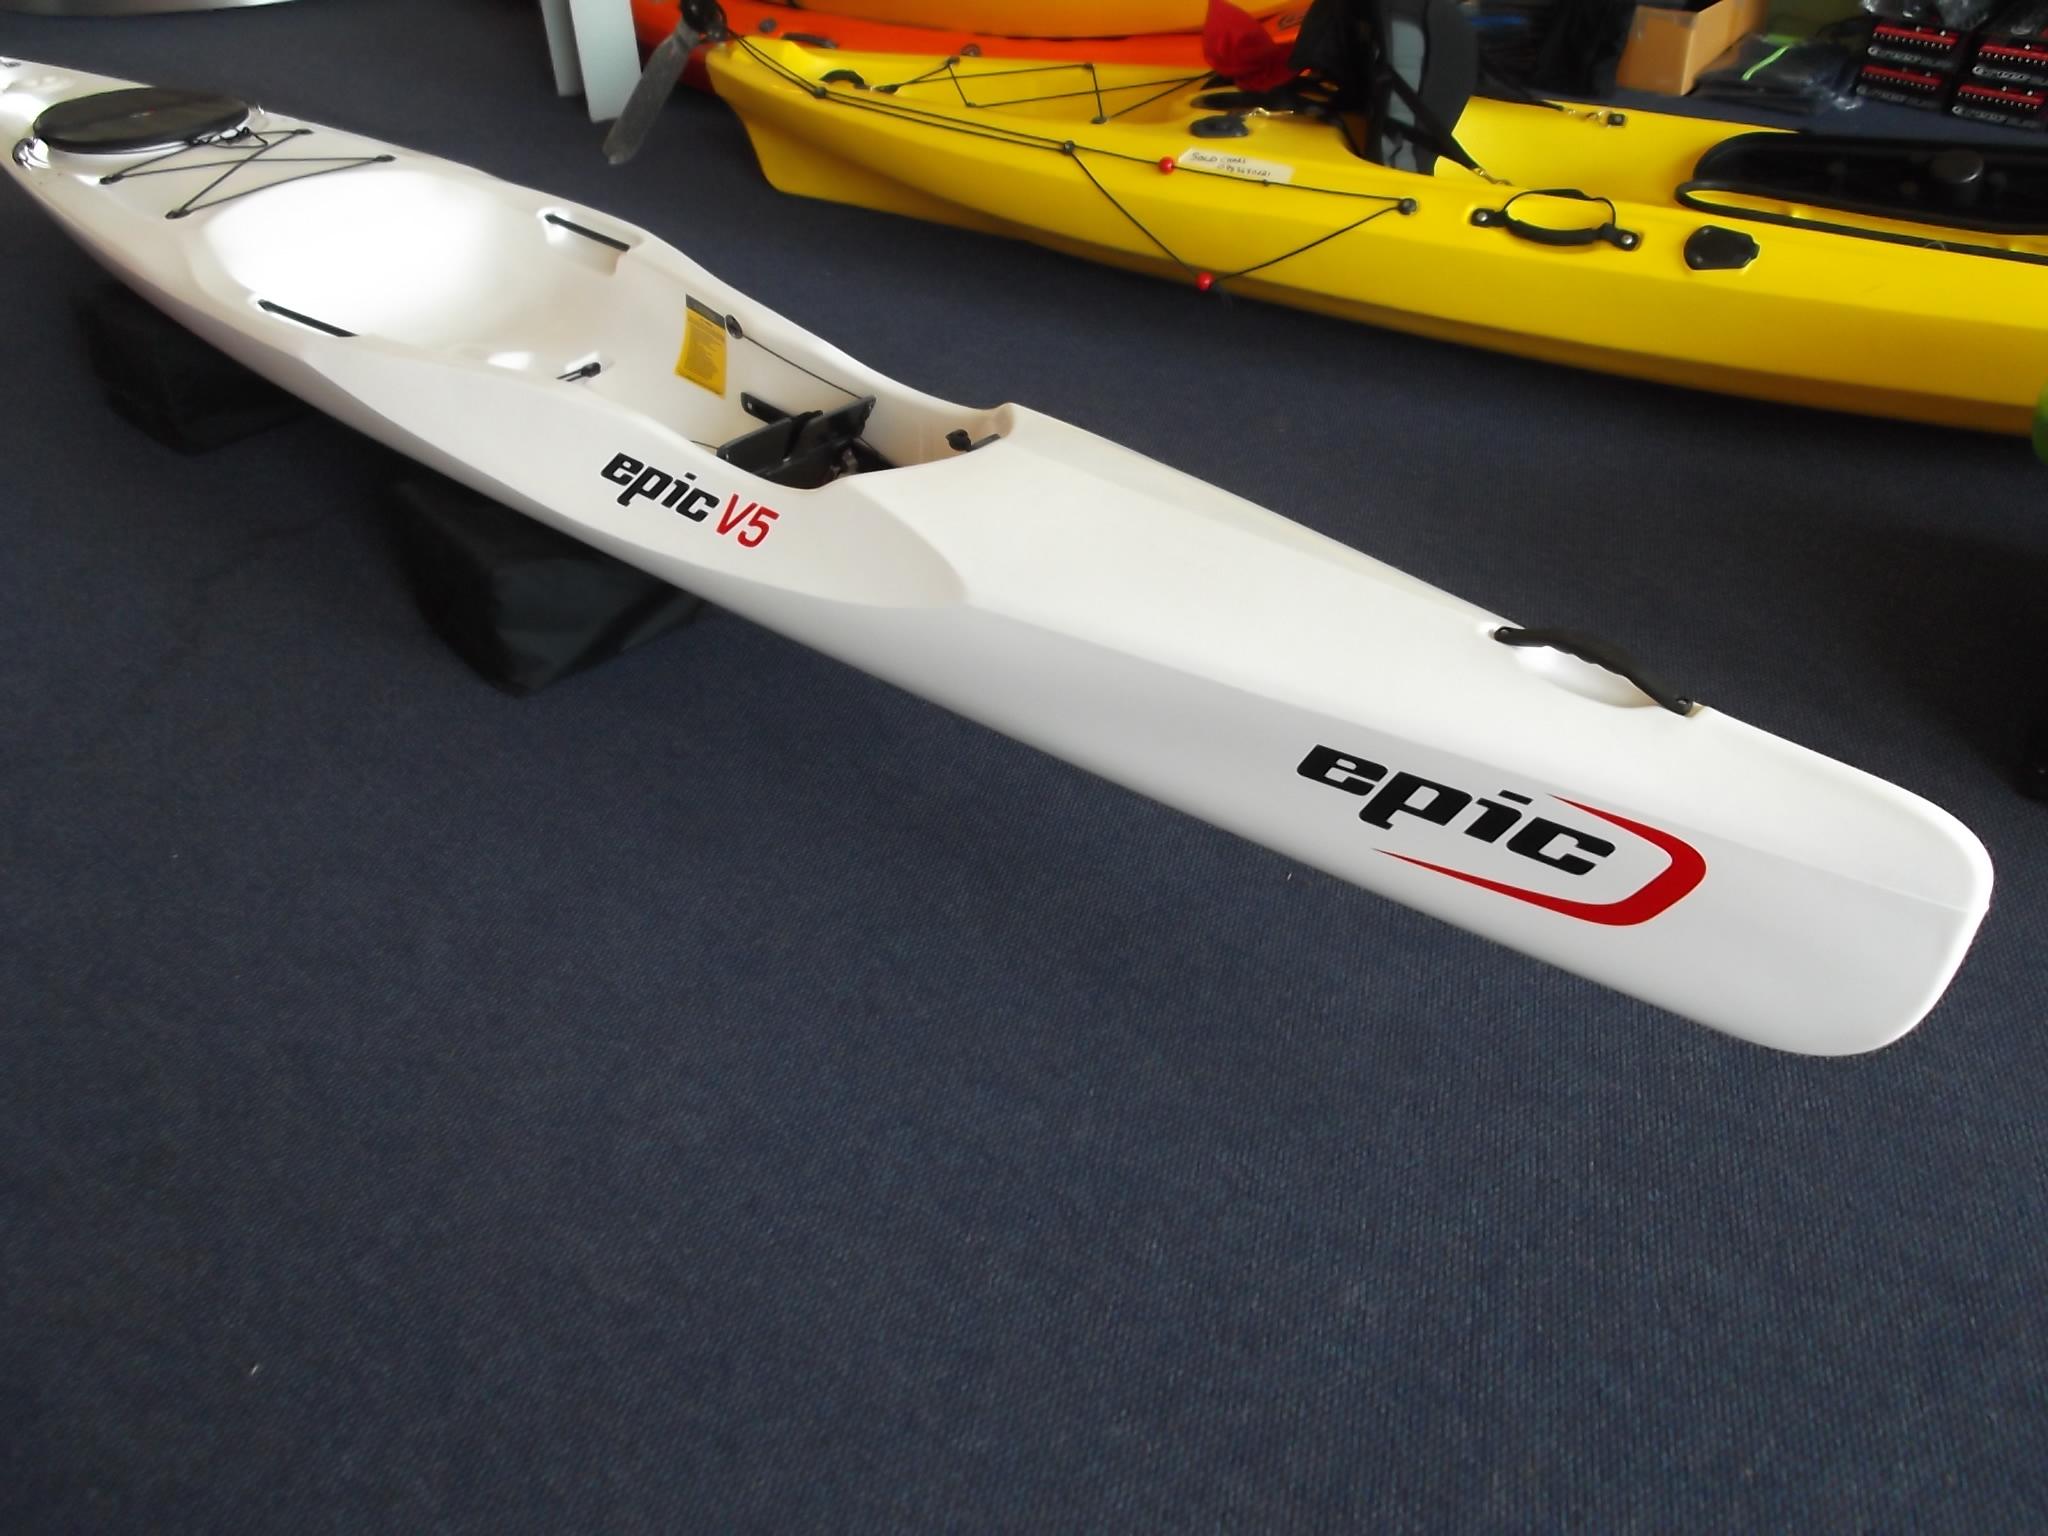 Epic V5 Plastic Kayak Brians